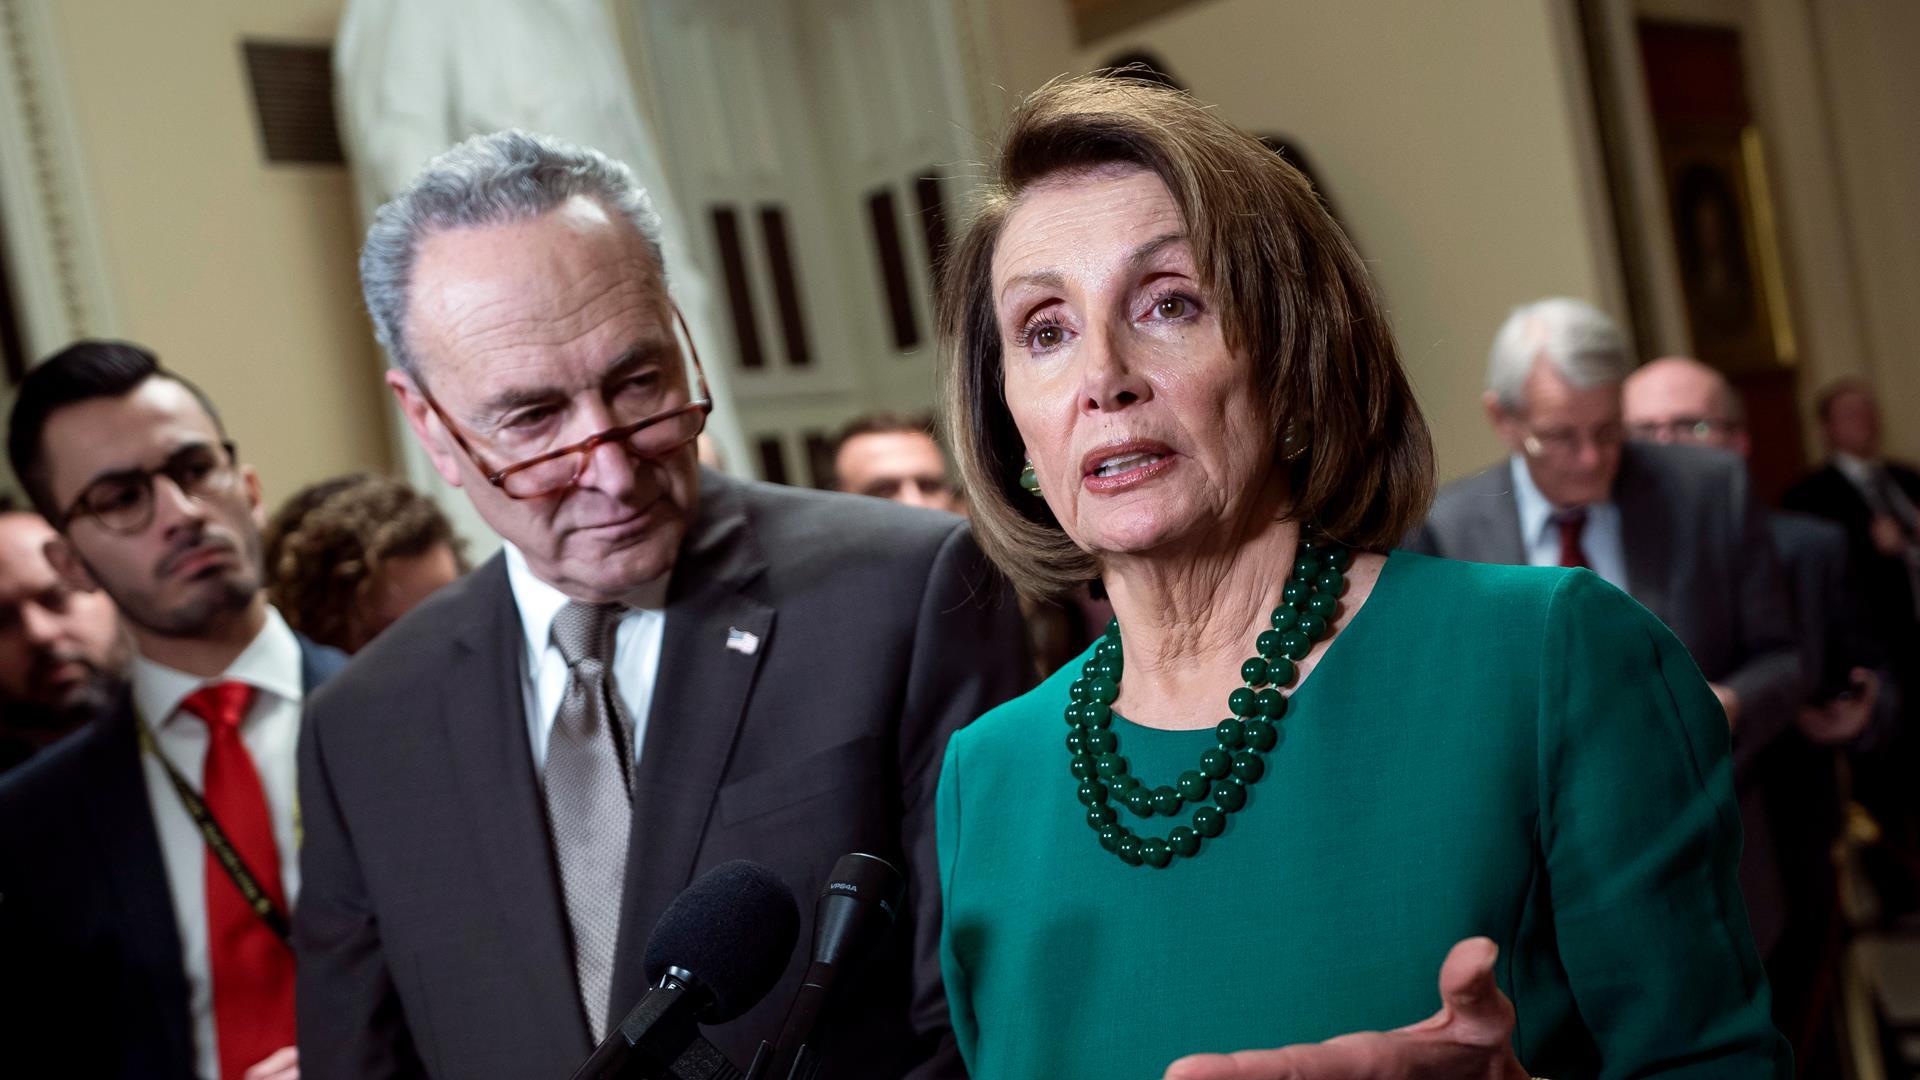 Trump defends keeping Democrats in the dark on al-Baghdadi raid